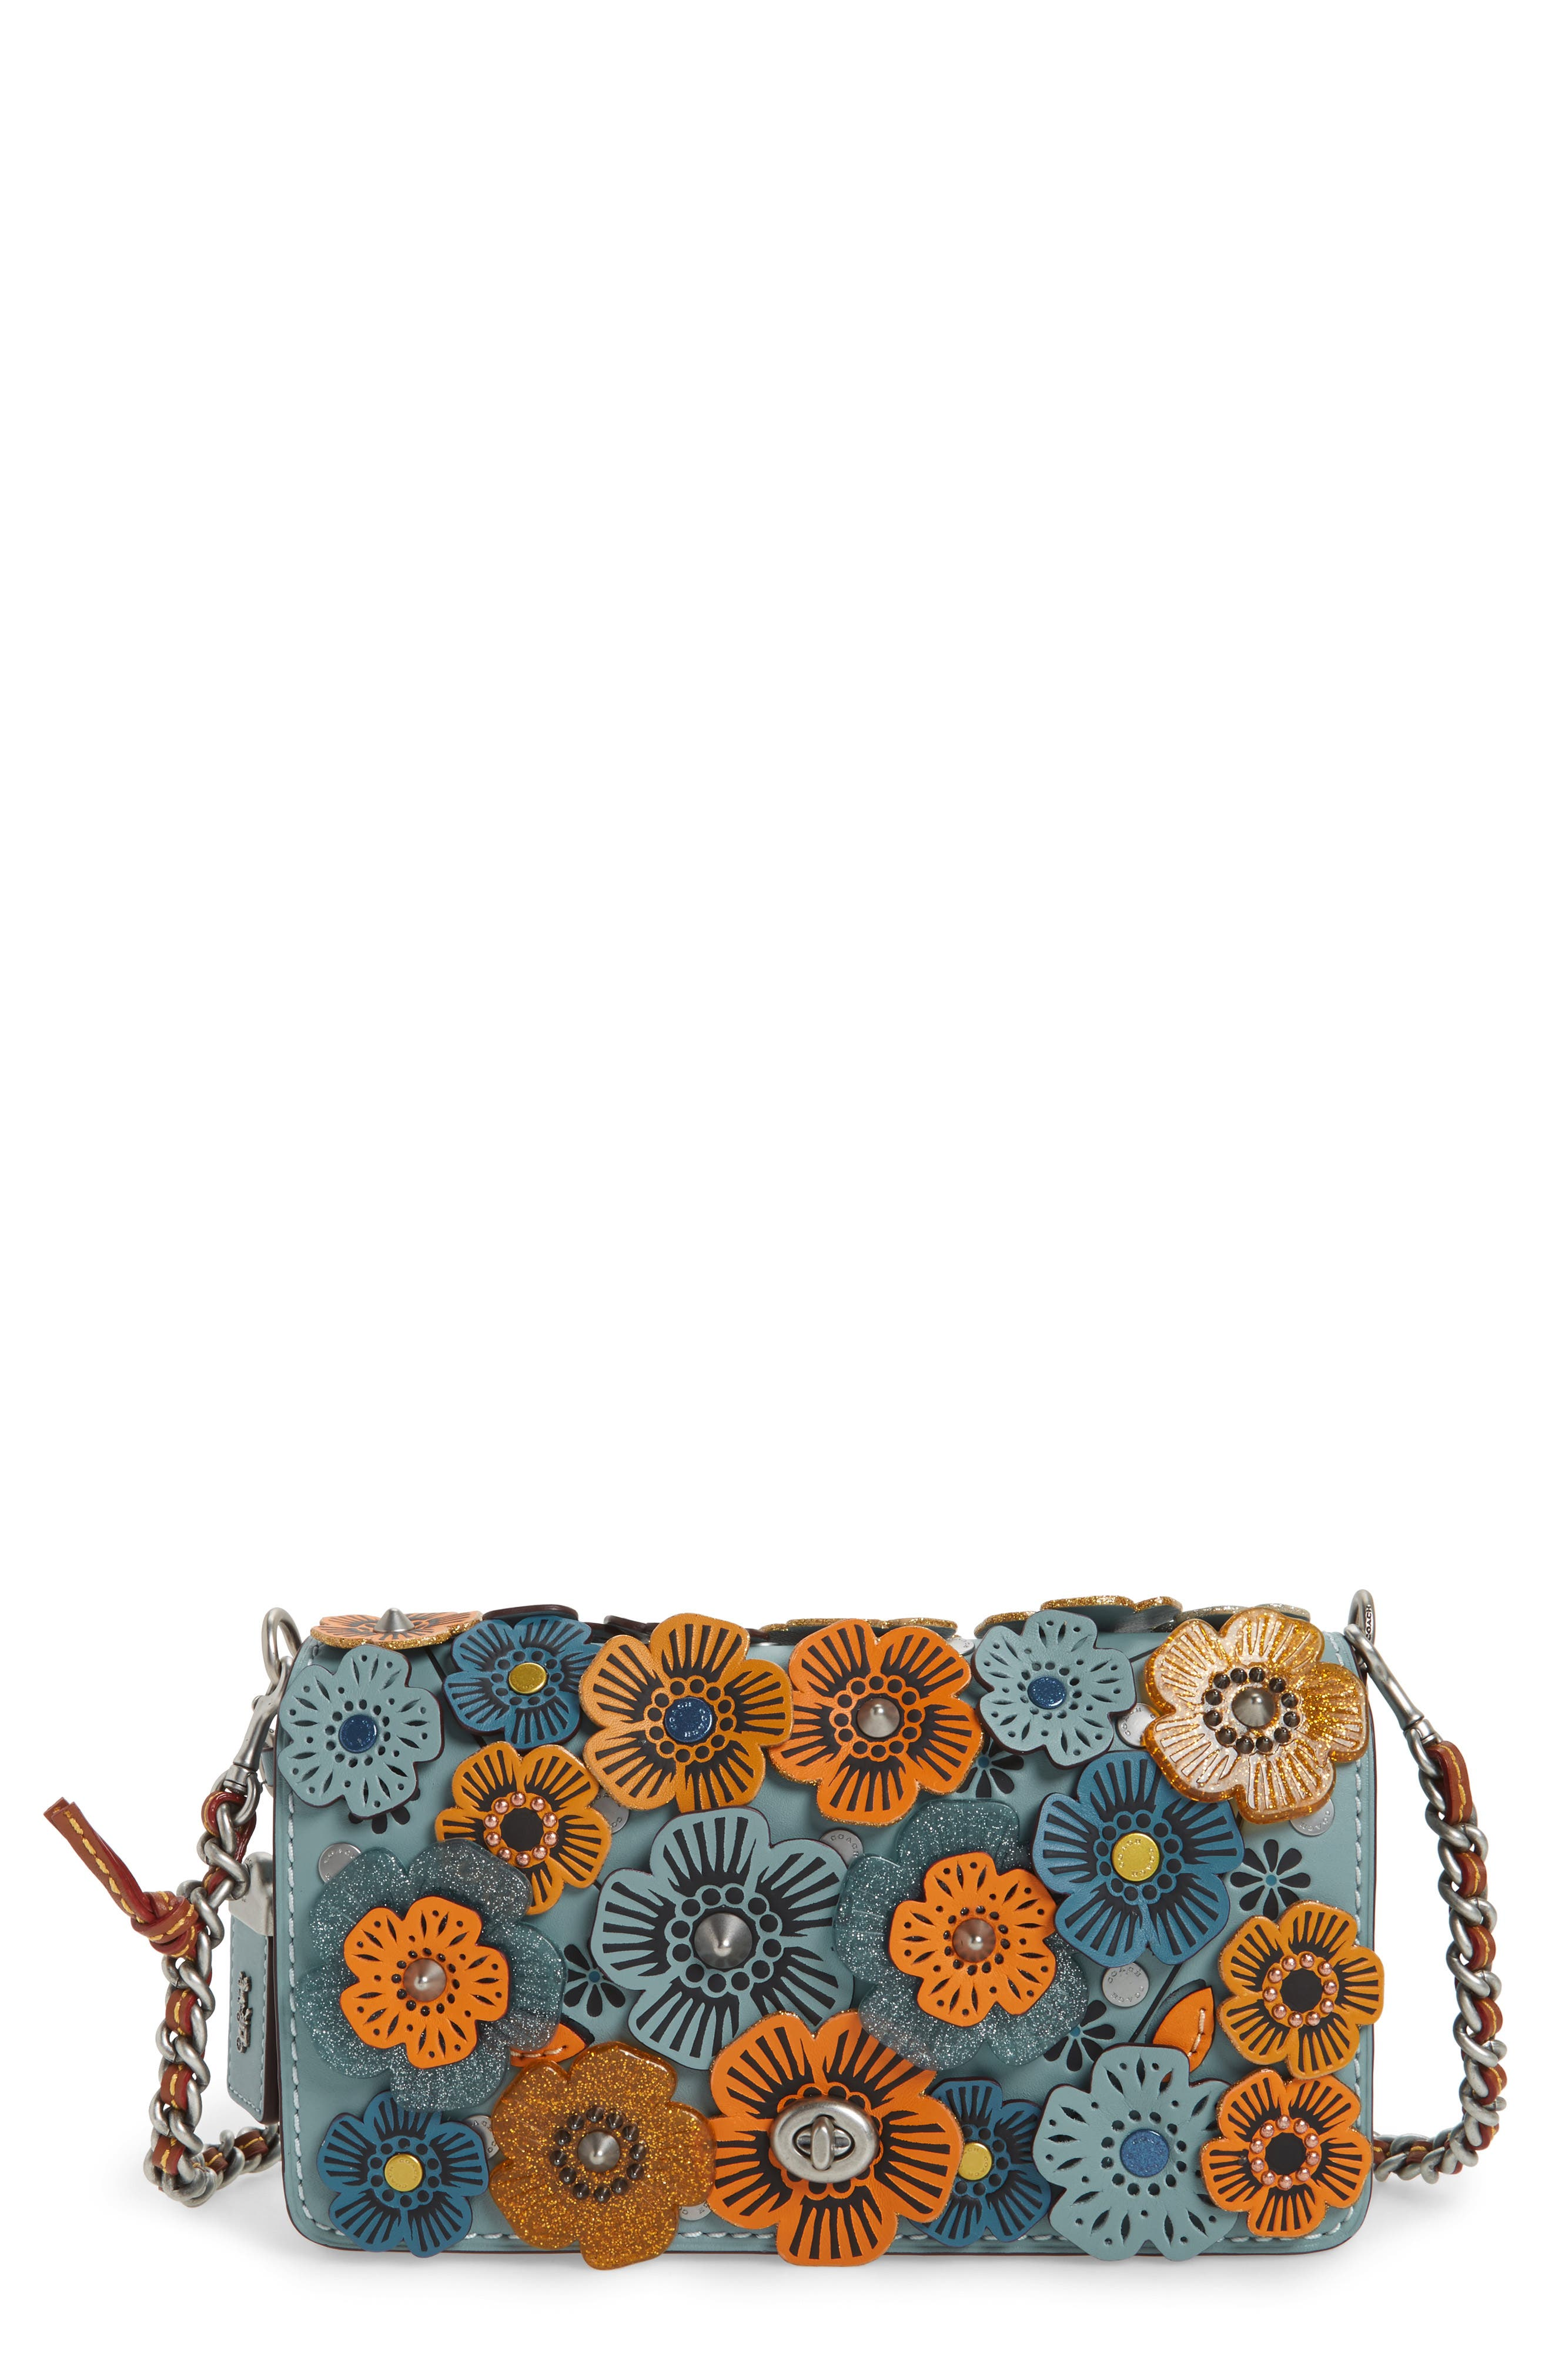 Main Image - COACH 1941 Dinky Tea Rose Appliqué Leather Crossbody Bag